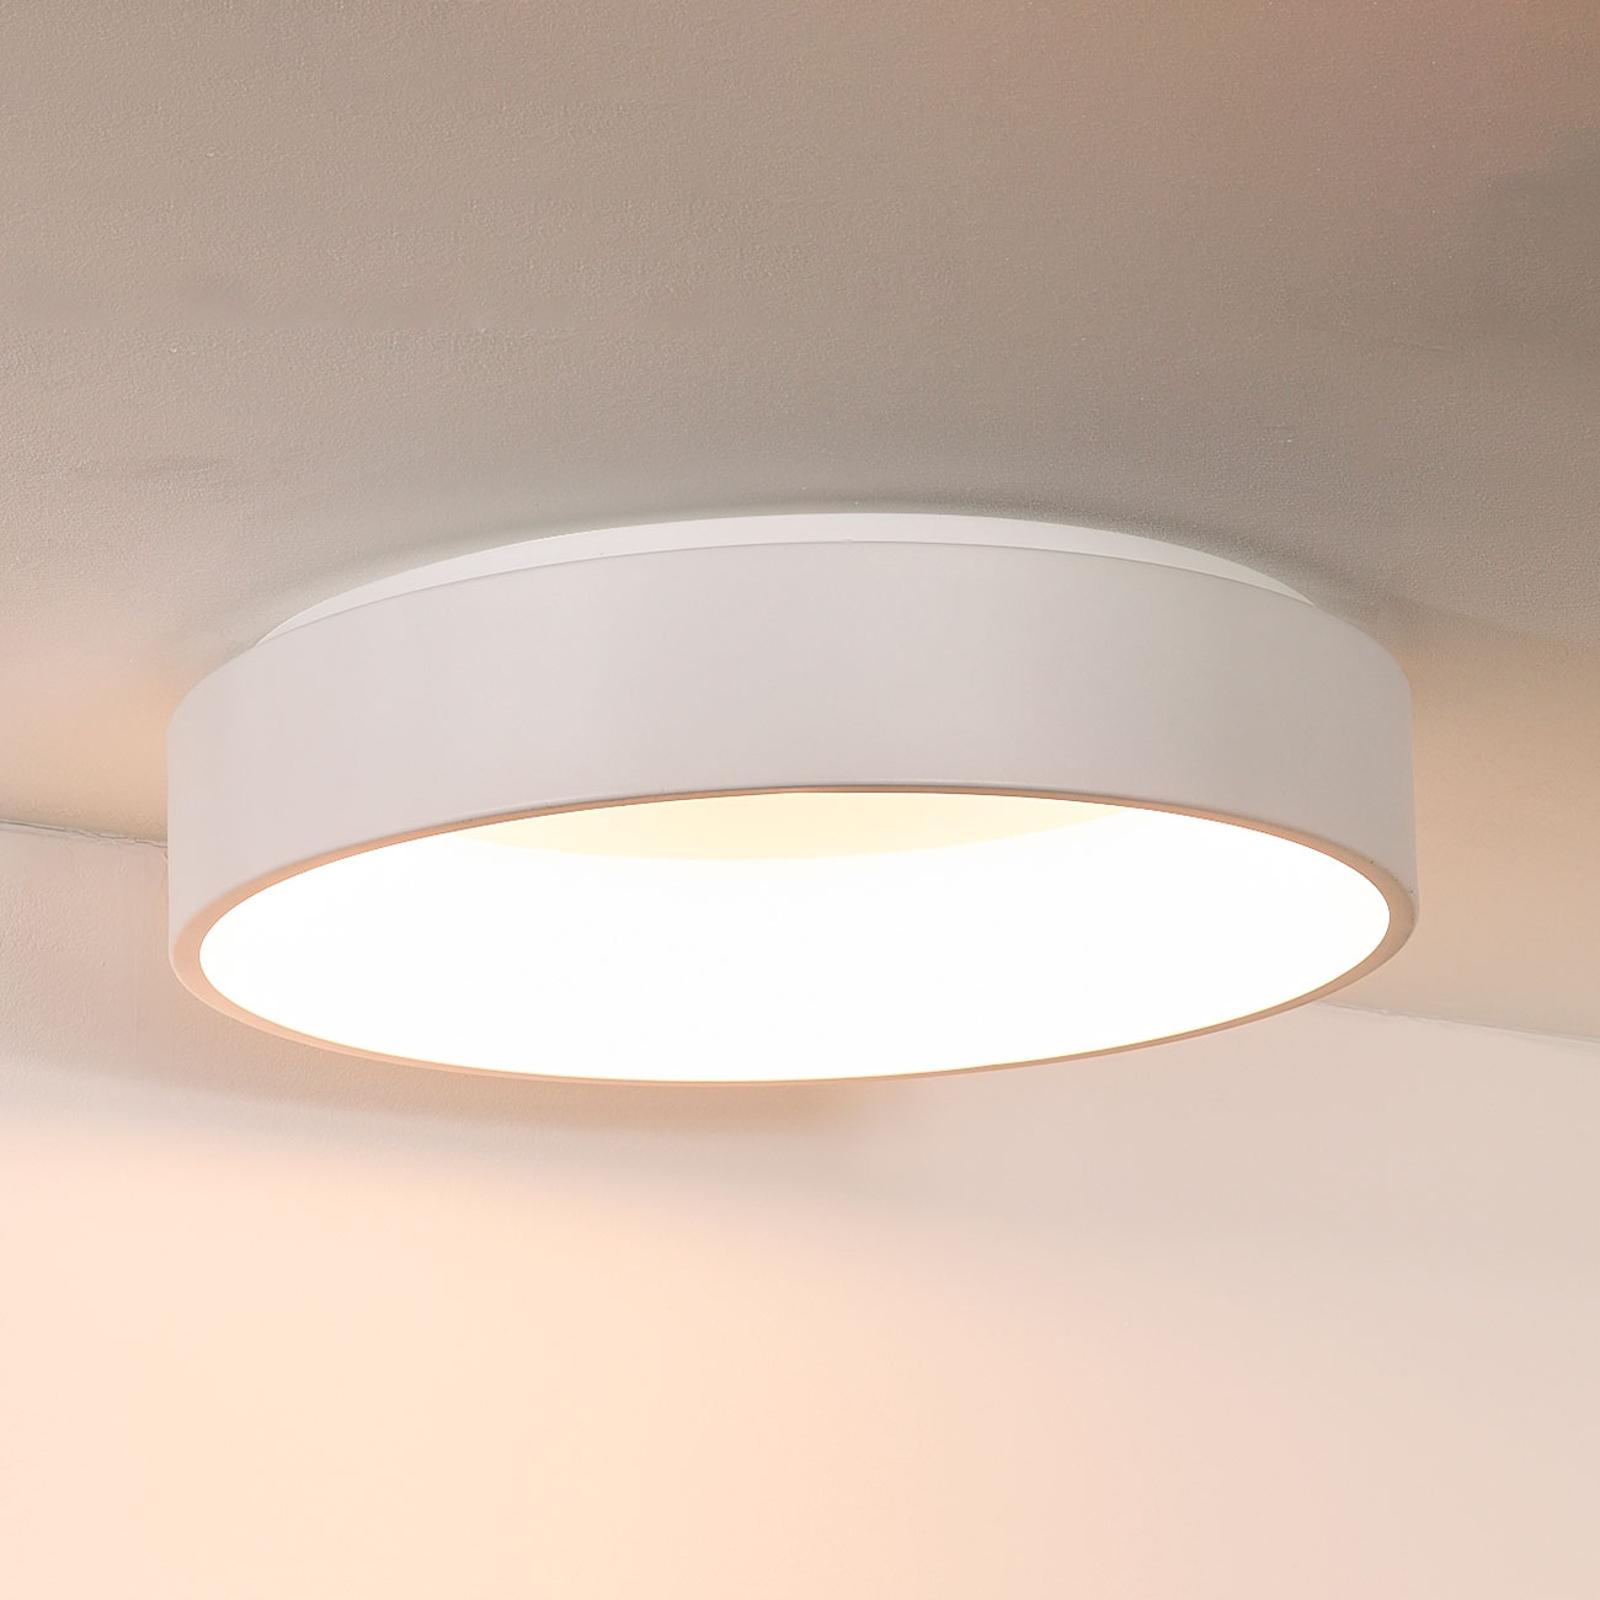 Lampa sufitowa LED Talowe, biała, Ø 60 cm